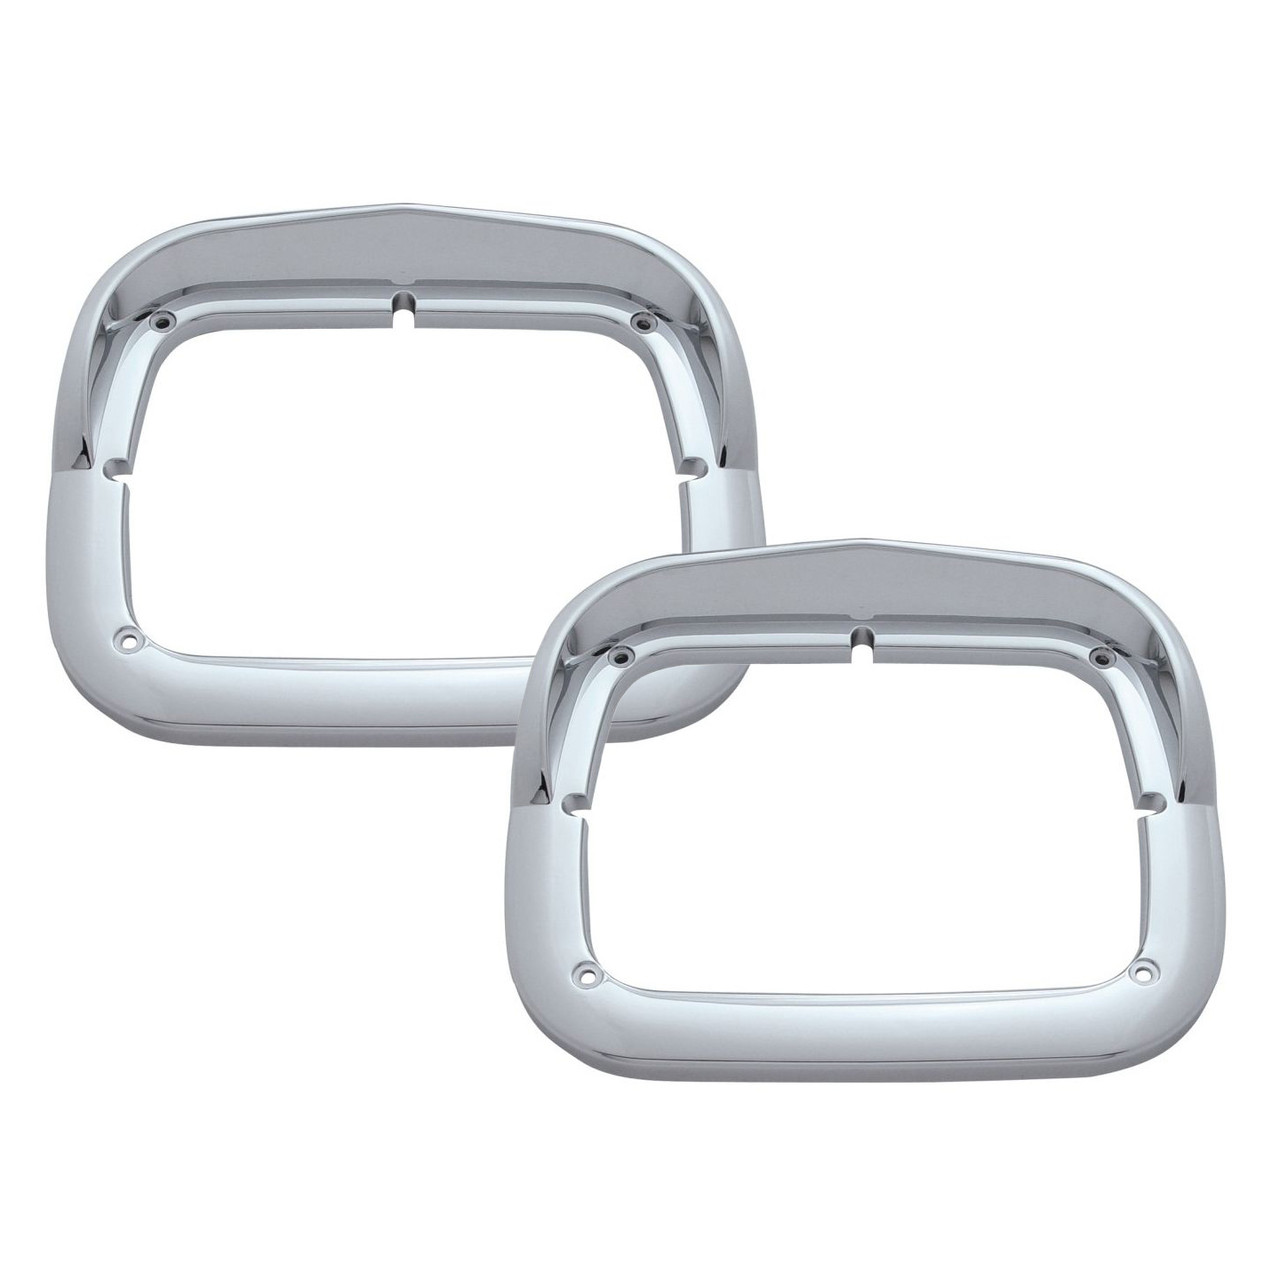 Chrome Plastic Headlight Bezels 6X8 single head light with visor for Peterbilt, Kenworth, Pair